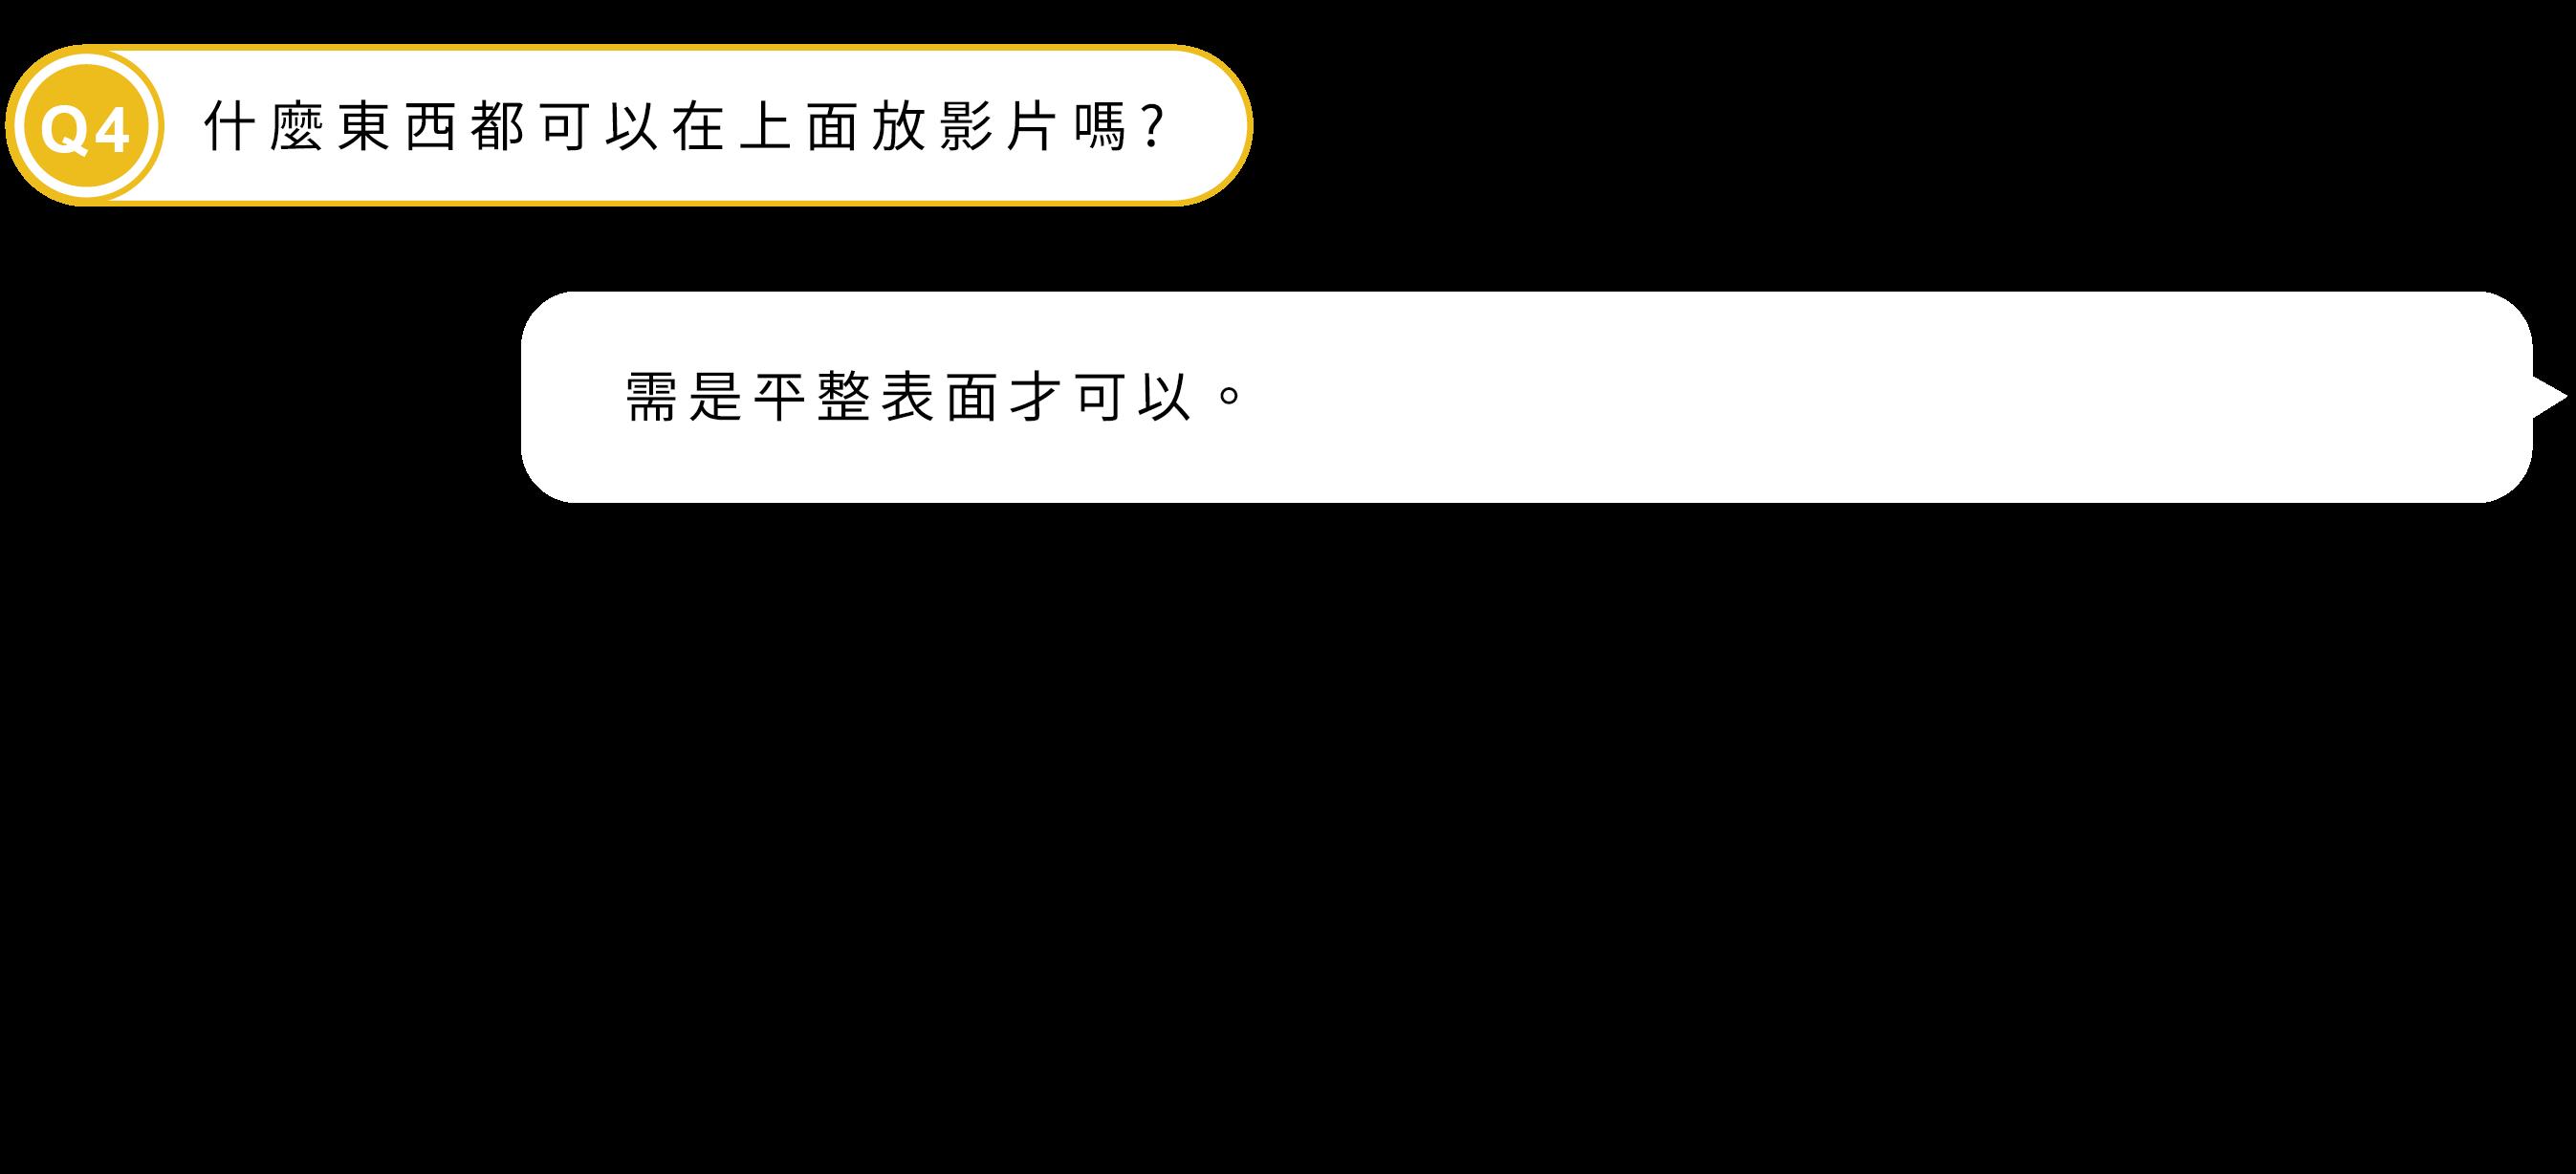 Q4-12 (1)